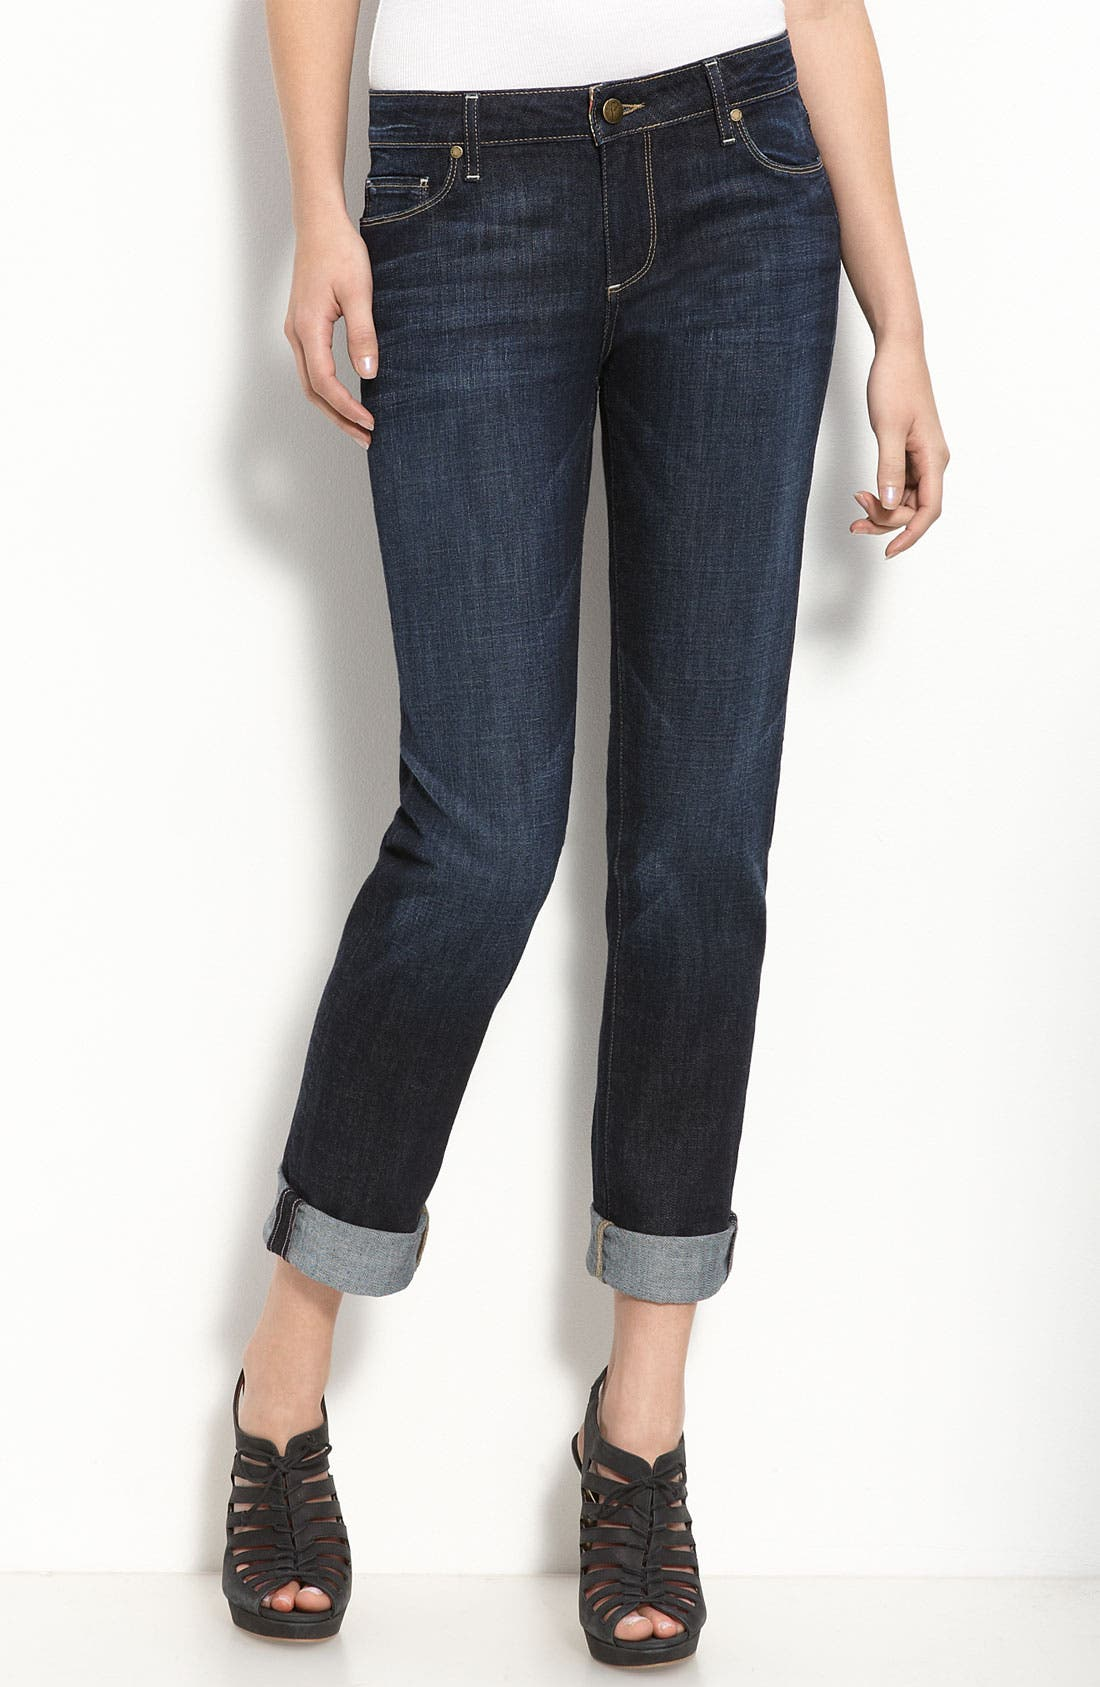 Denim 'Jimmy Jimmy' Stretch Jeans,                             Main thumbnail 1, color,                             410